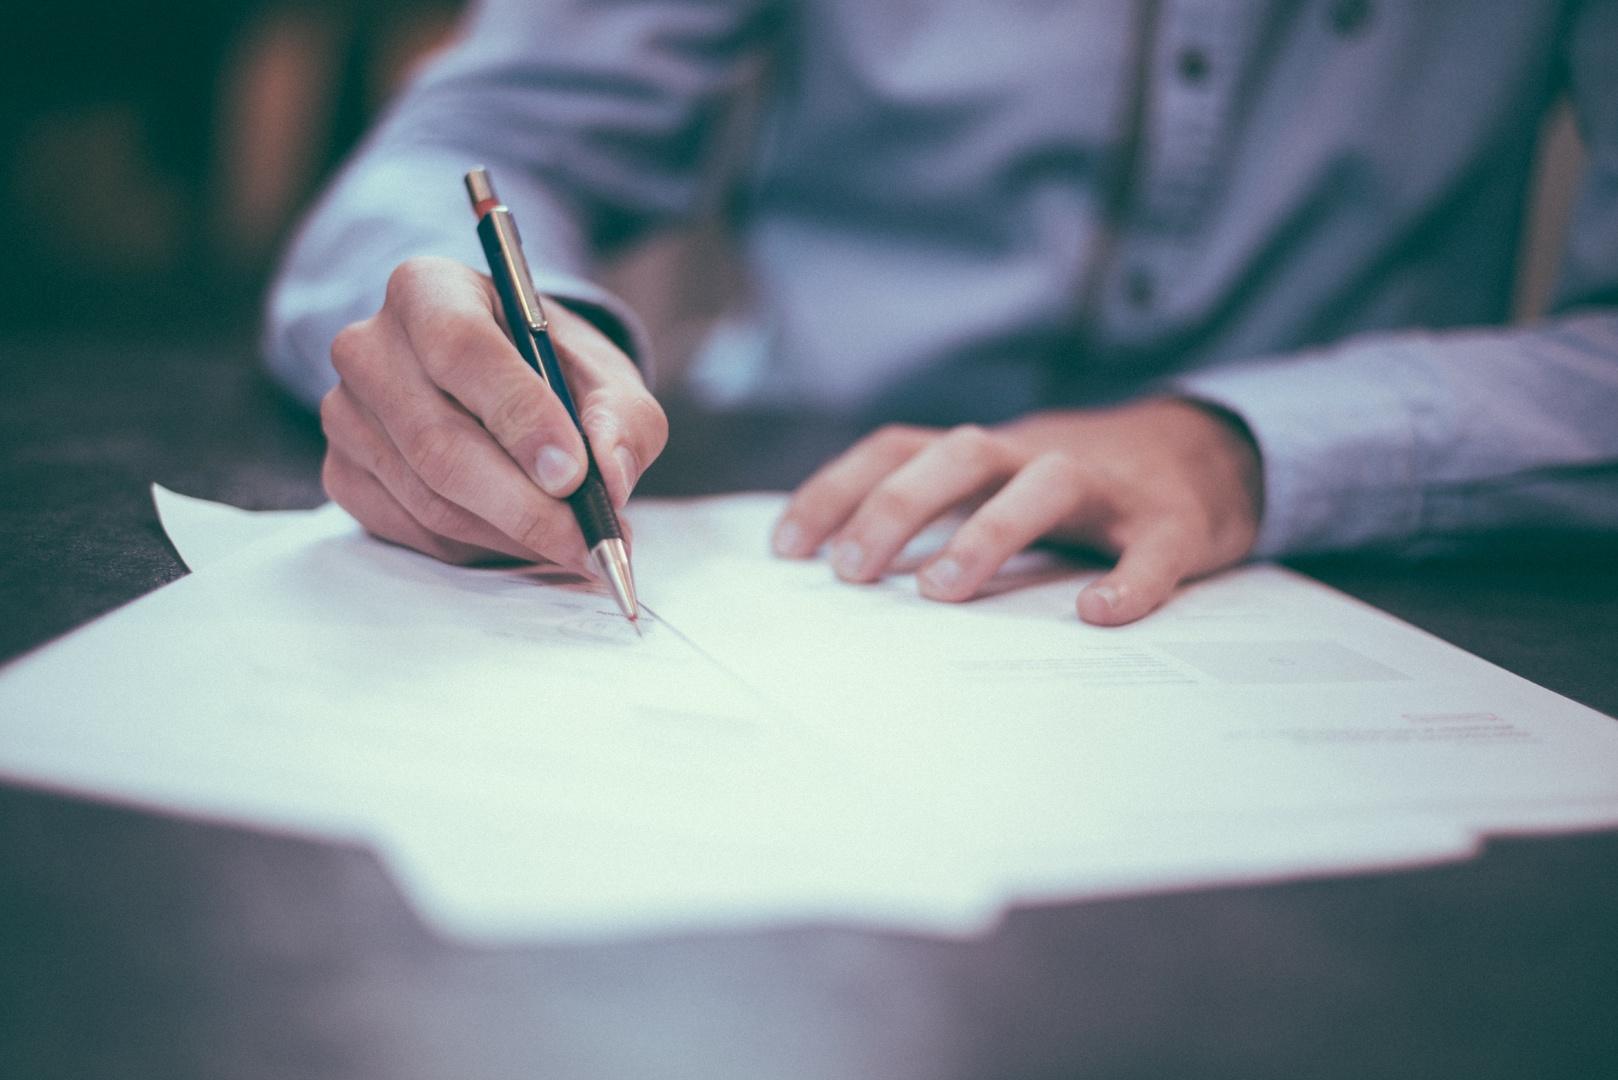 Asesoramiento Administrativo, Civil, Mercantil y Penal